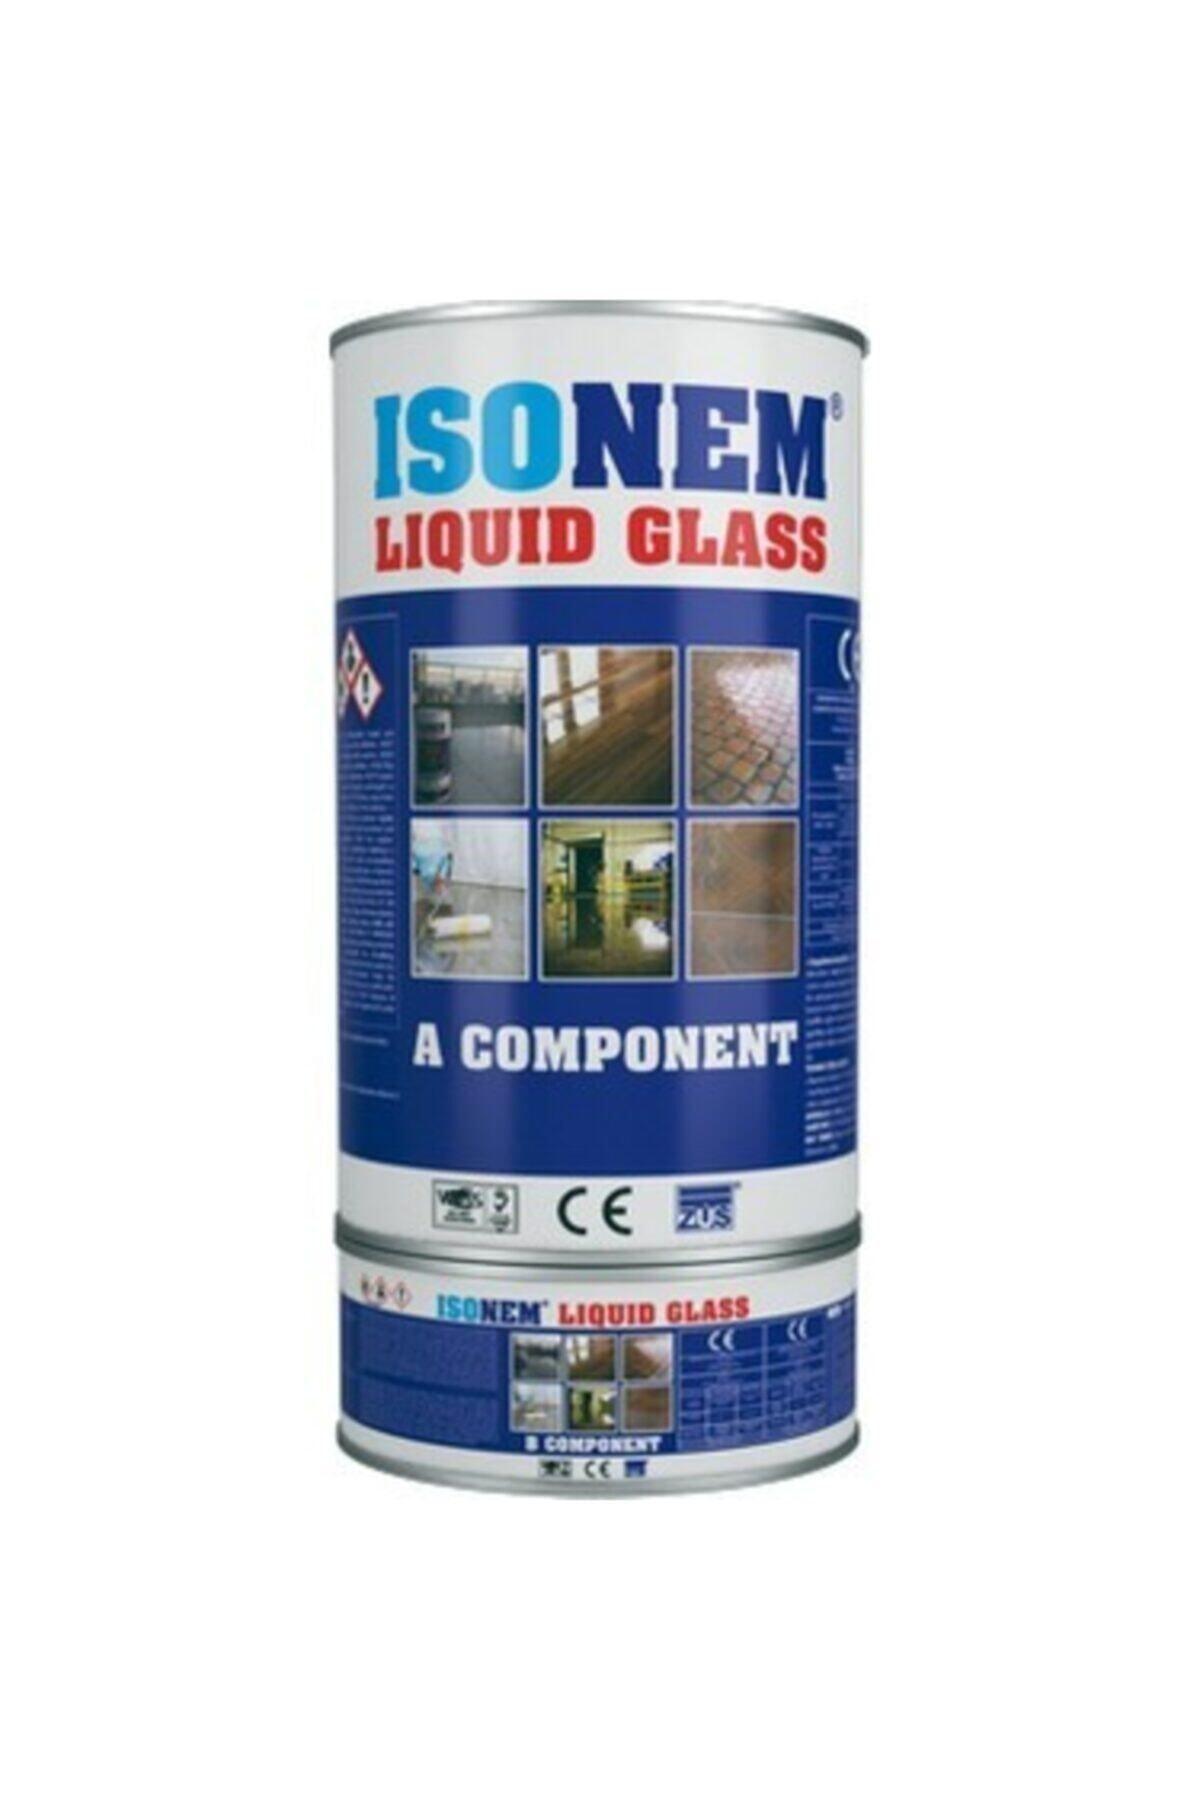 Isonem Liquid Glass Sıvı Cam Şeffaf Ve Parlak Su Yalıtımı 2 Kg 1